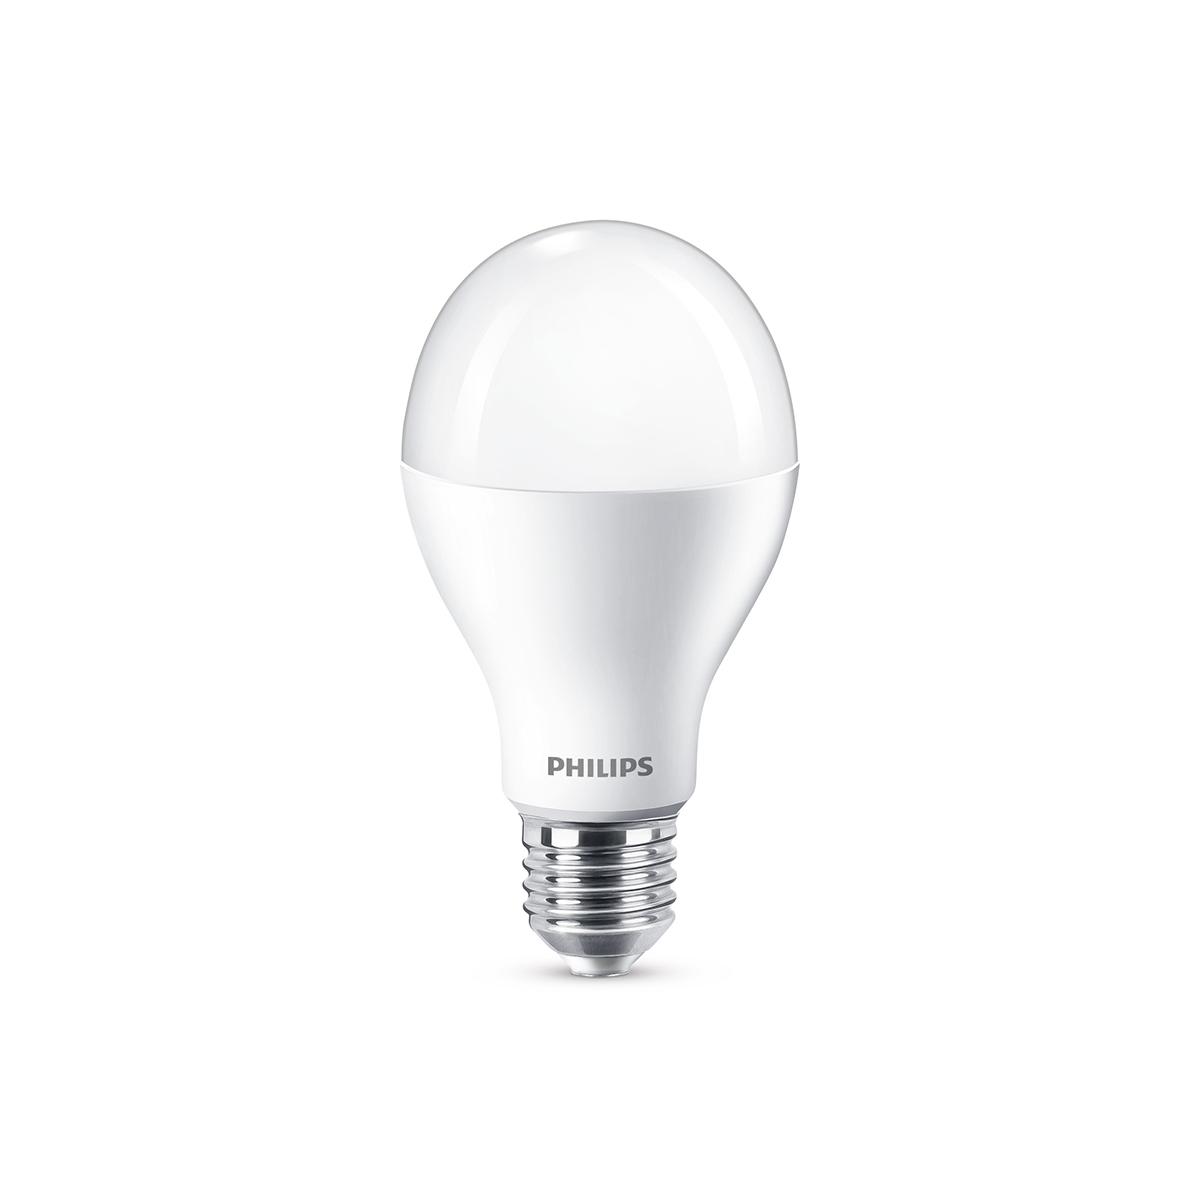 philips leuchtmittel led lampe e27 13 5 w warmwei dimmbar. Black Bedroom Furniture Sets. Home Design Ideas